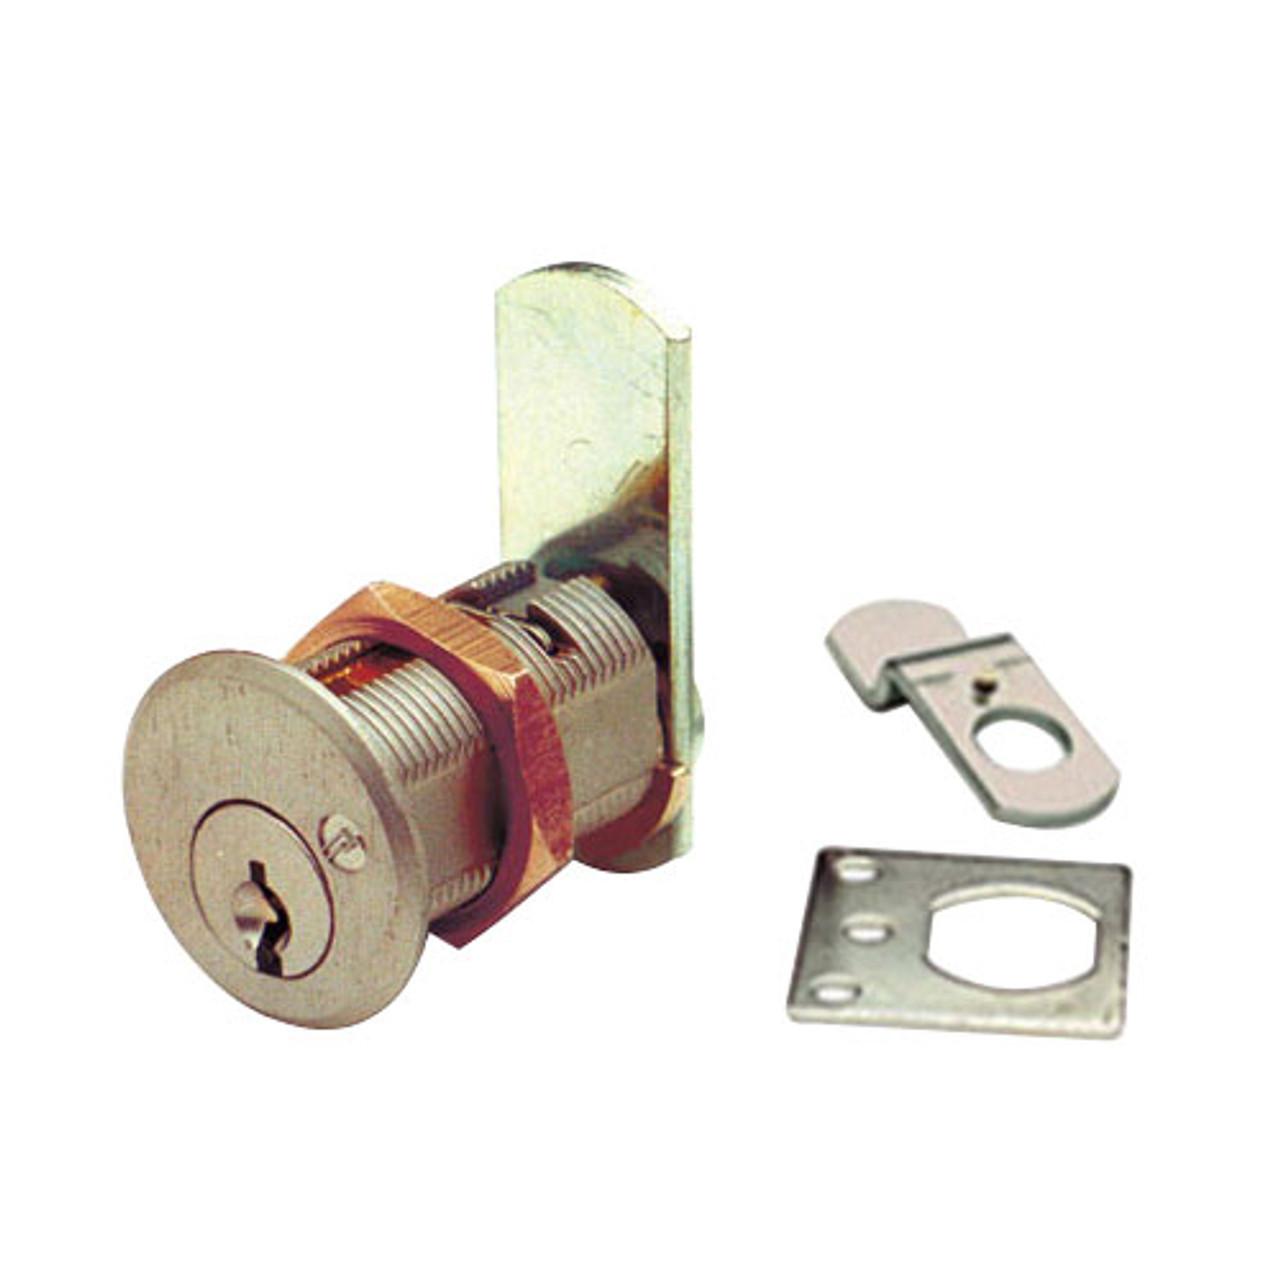 Olympus DCR1-KD-US3 Cam Locks in Bright Brass Finish